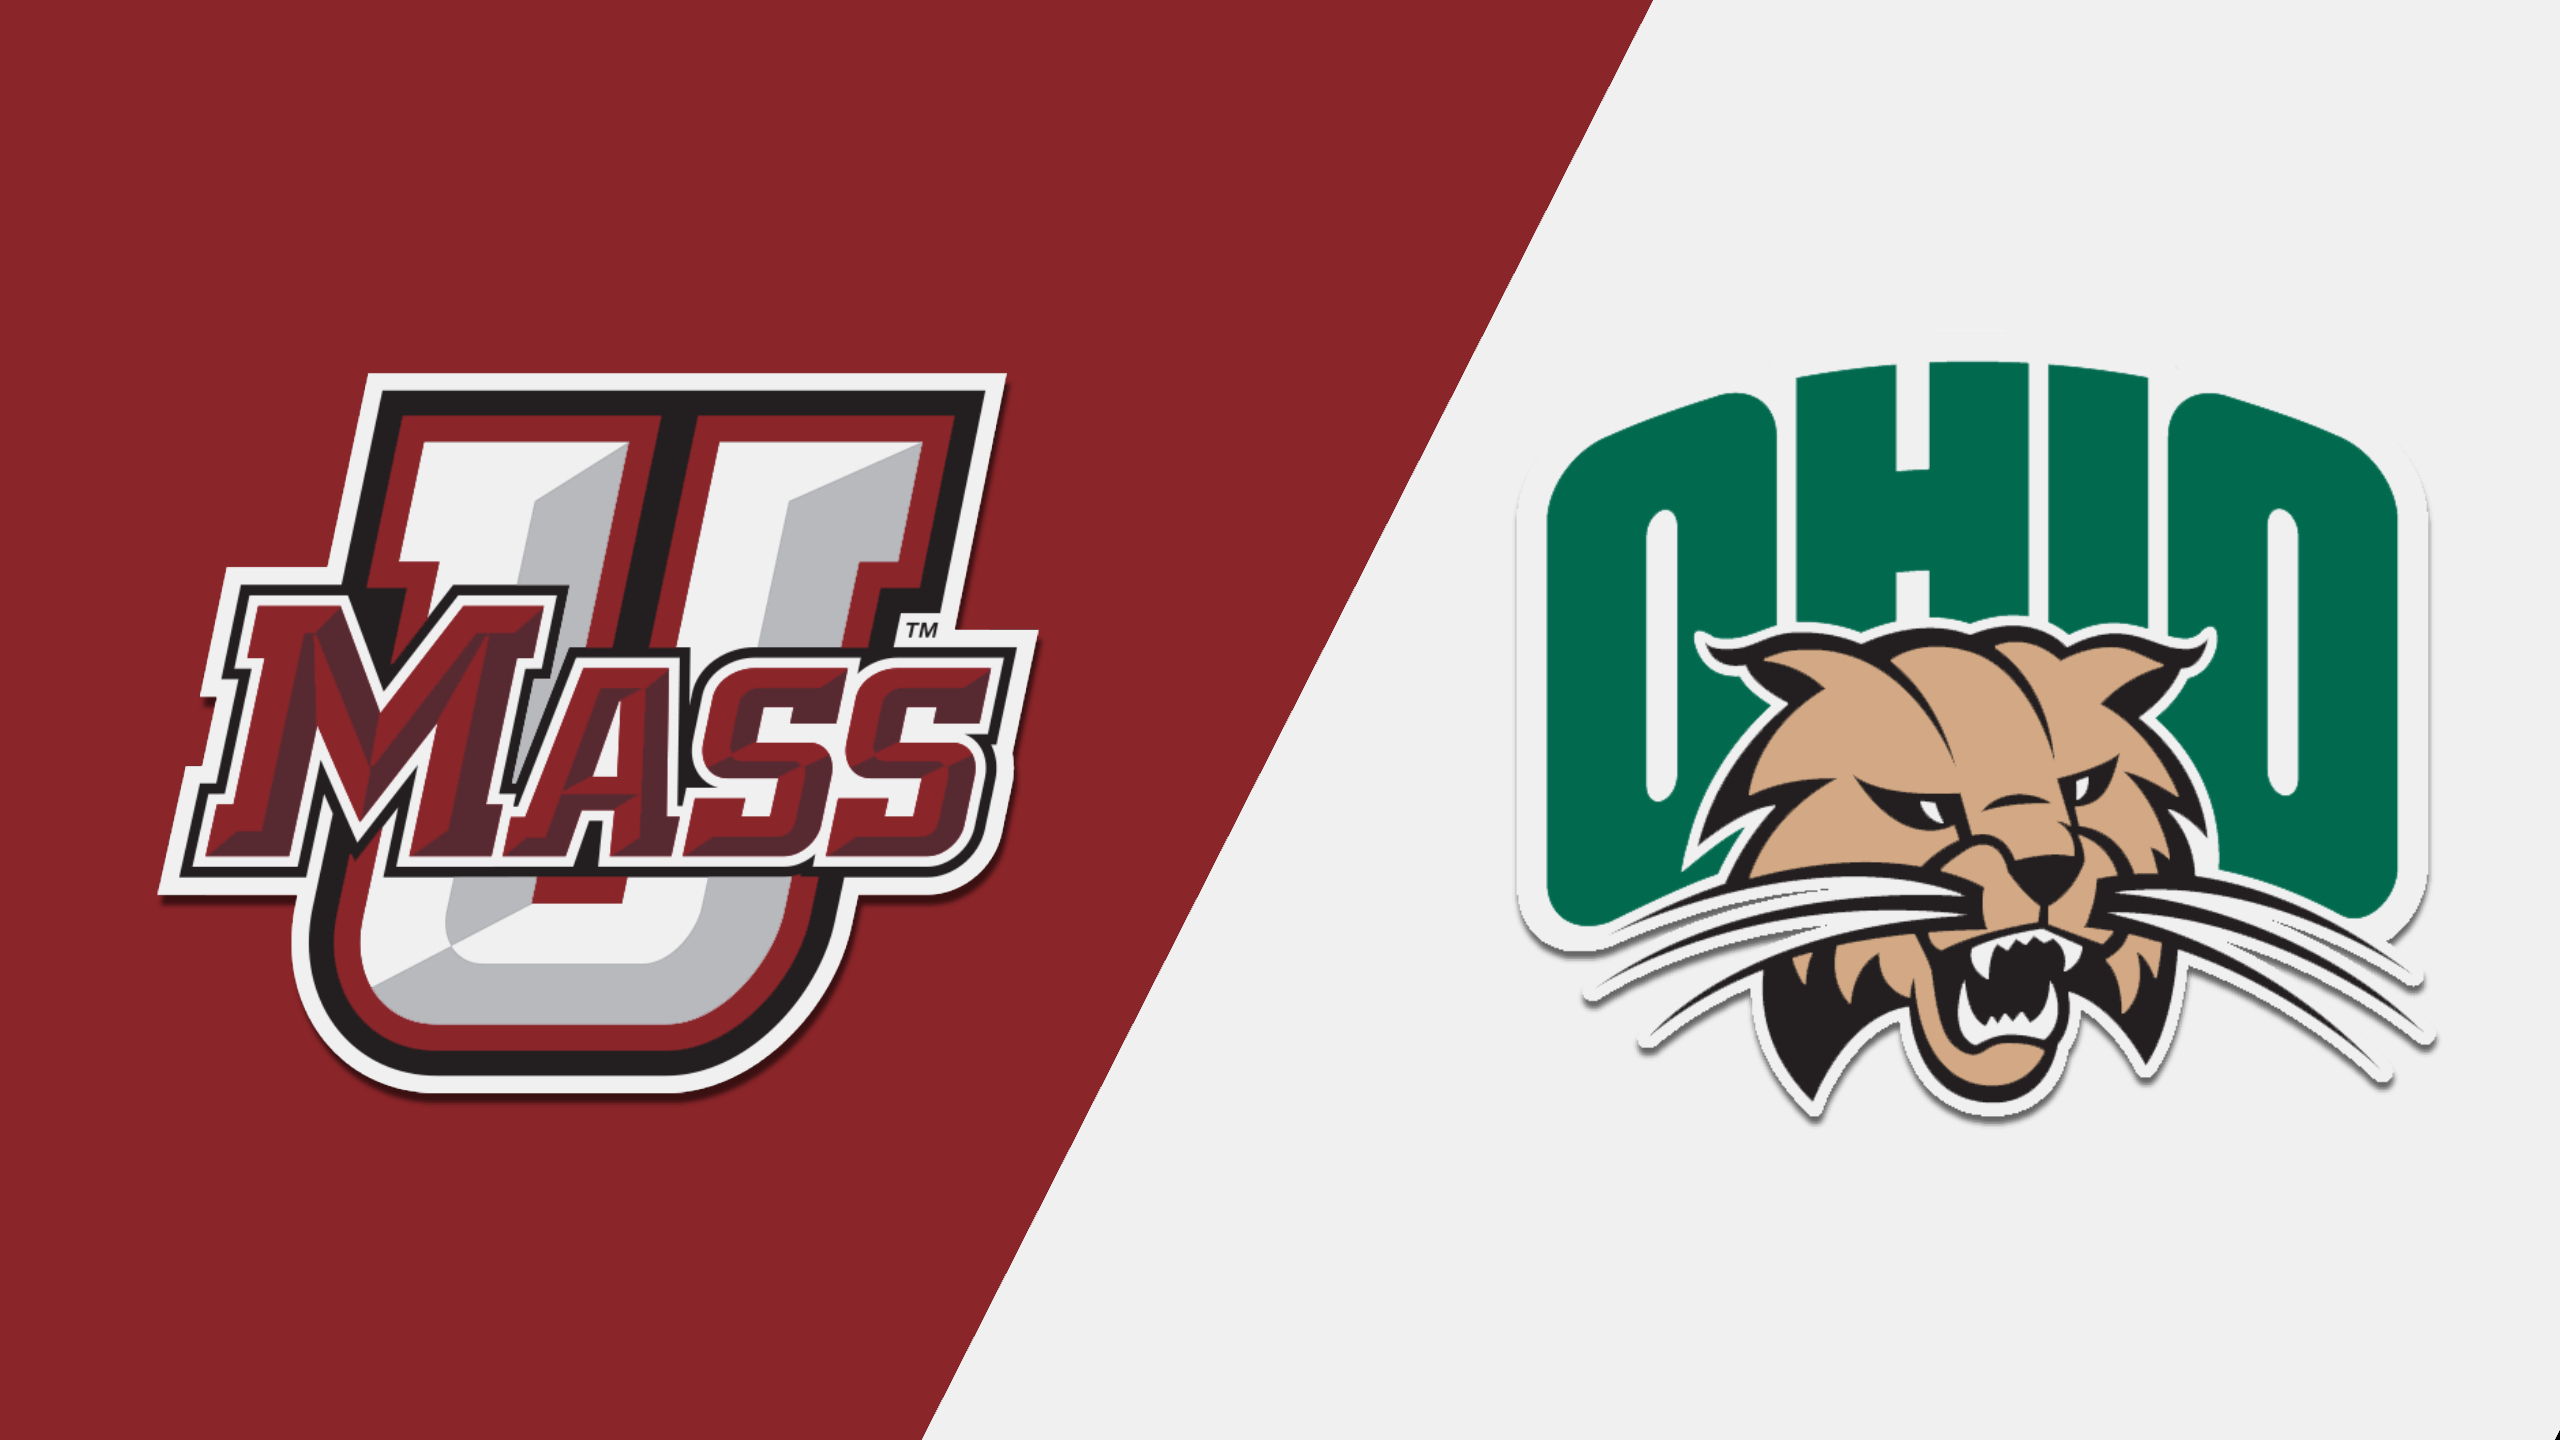 UMass vs. Ohio (Football)